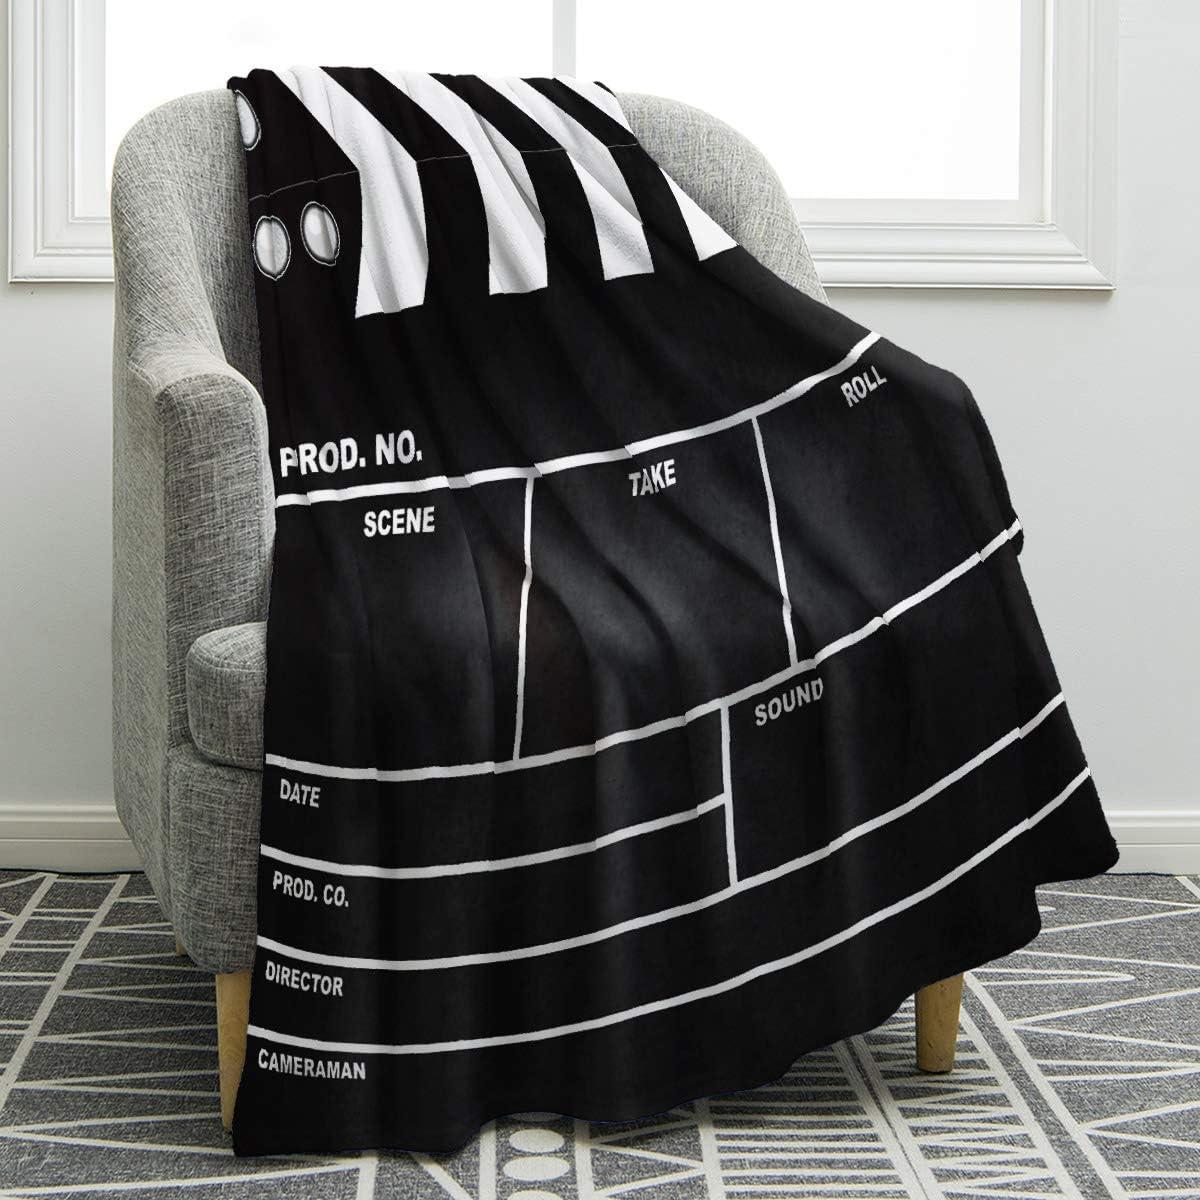 4. Movie Clapboard Print Soft Throw Blanket